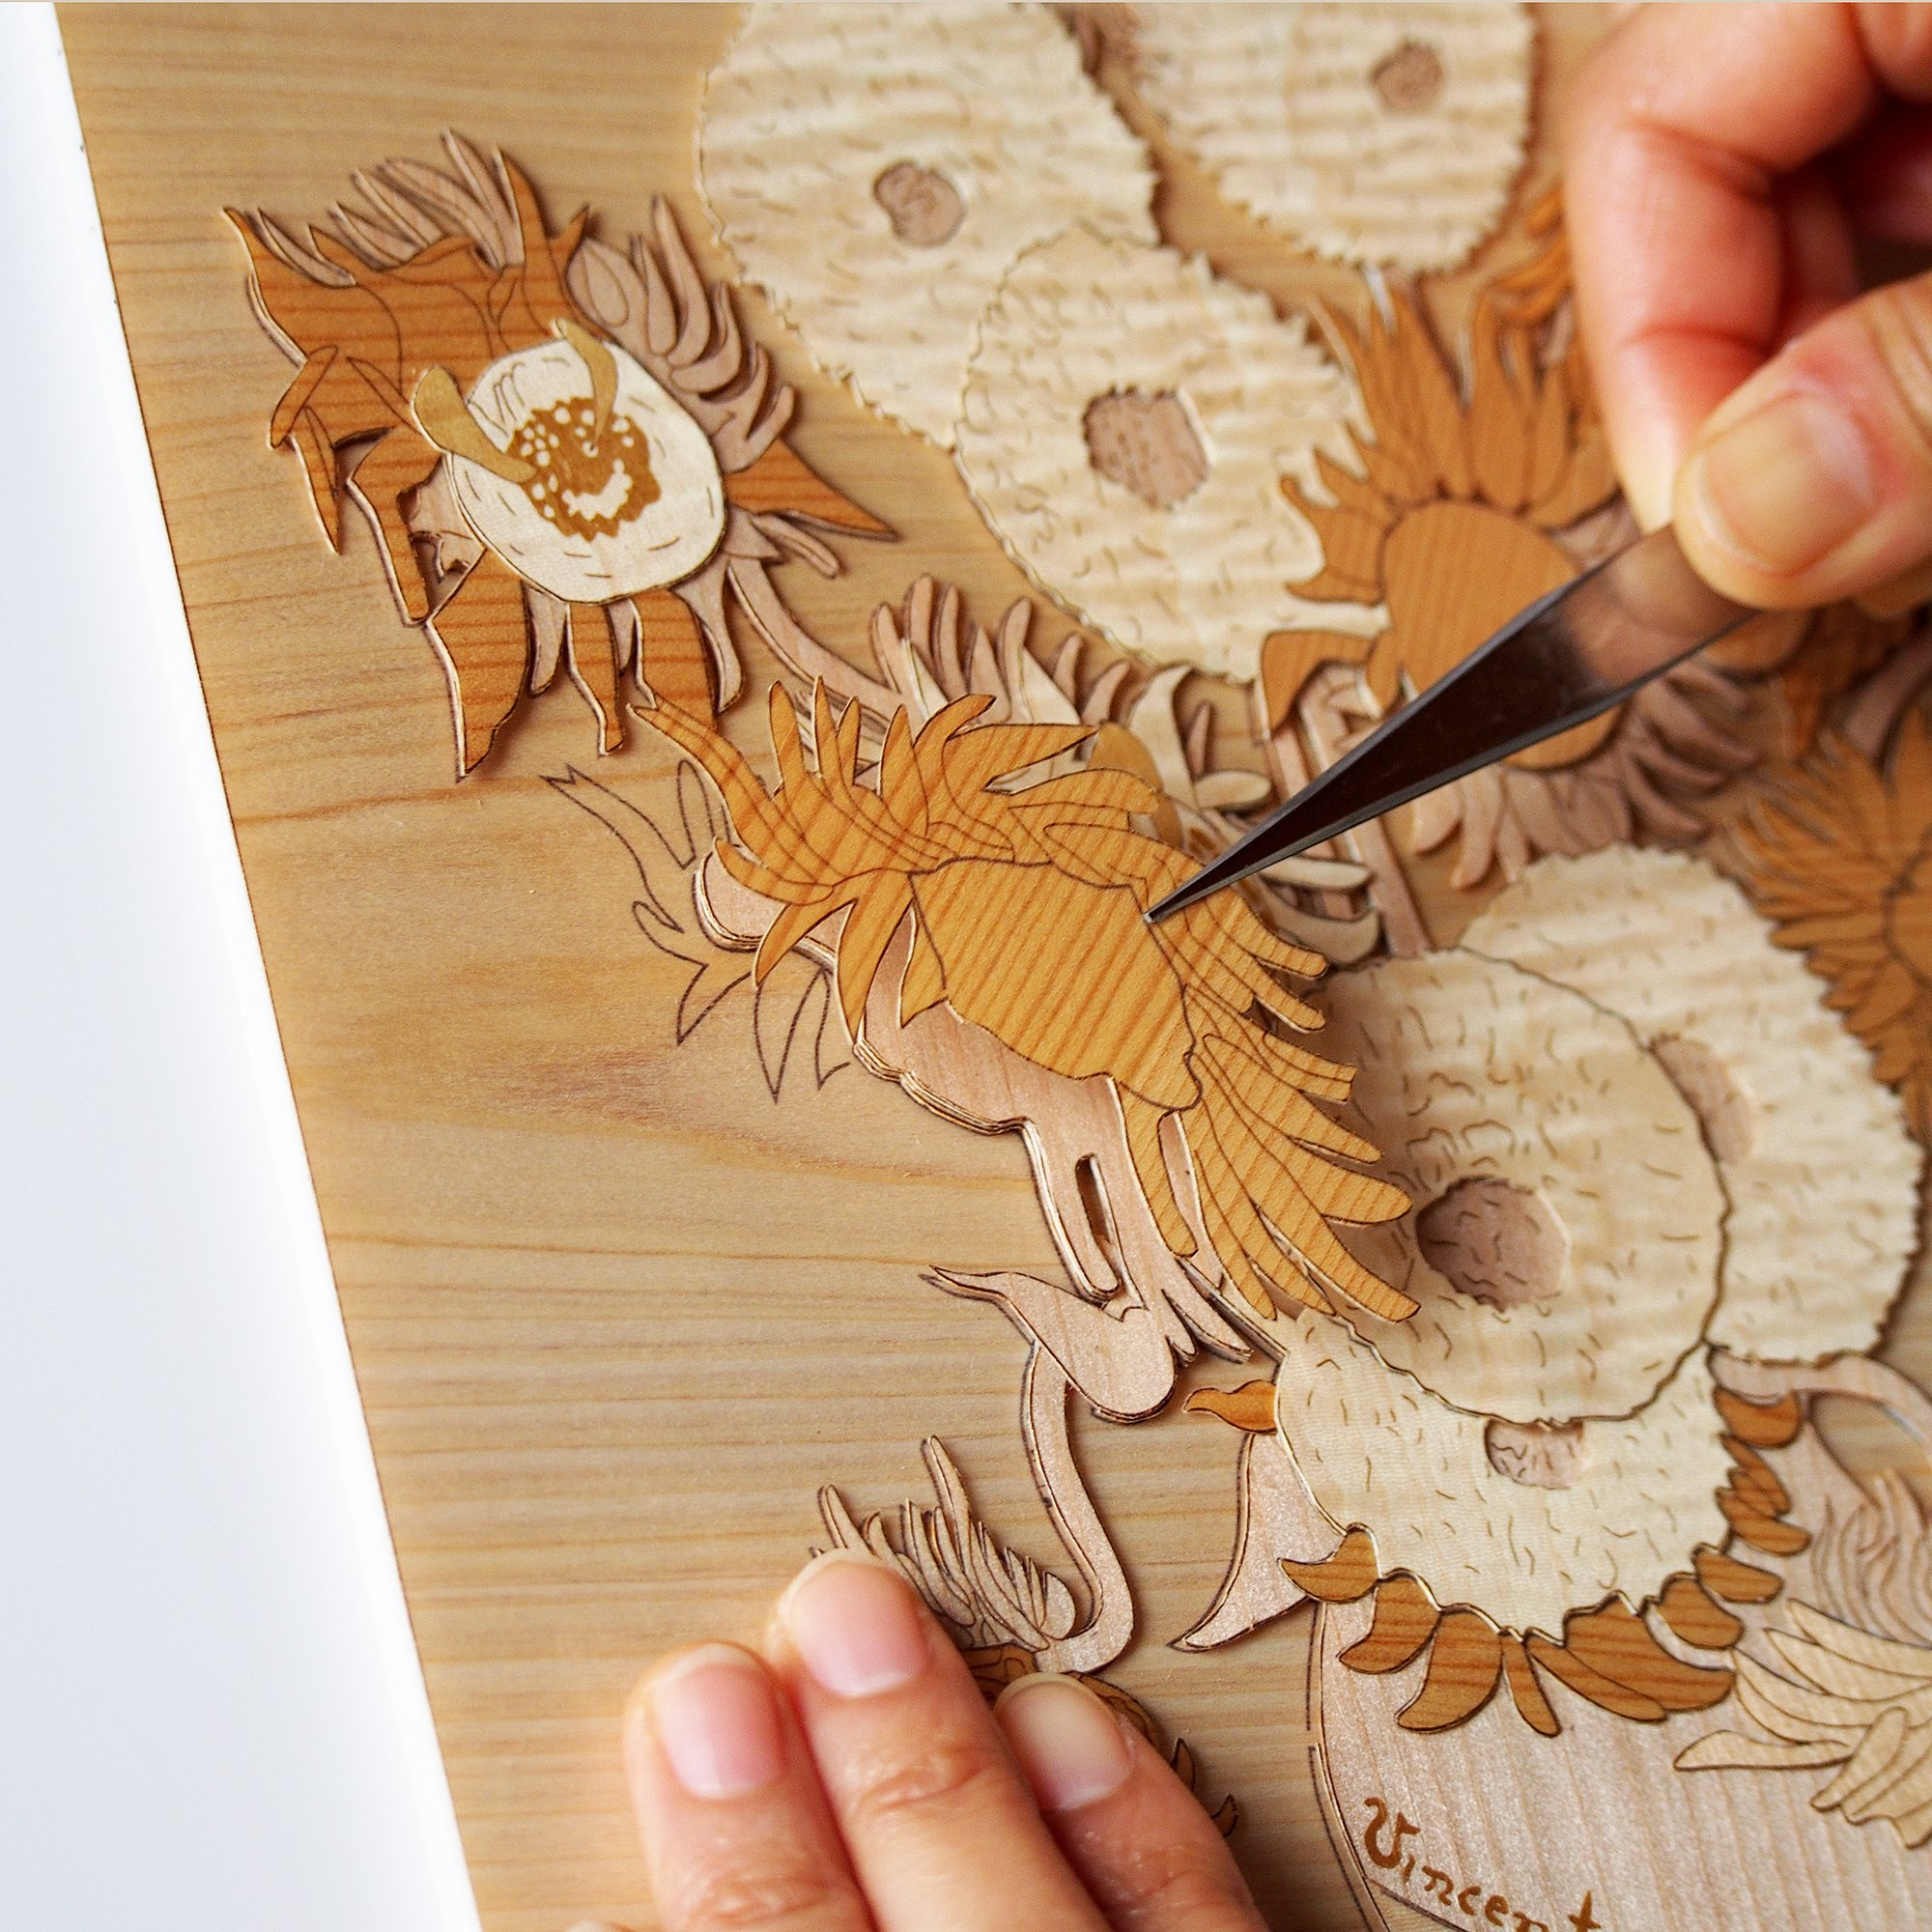 KINOWA Wooden Art Kit Kiharie Sunflowers Made in Japan by KINOWA (Image #5)